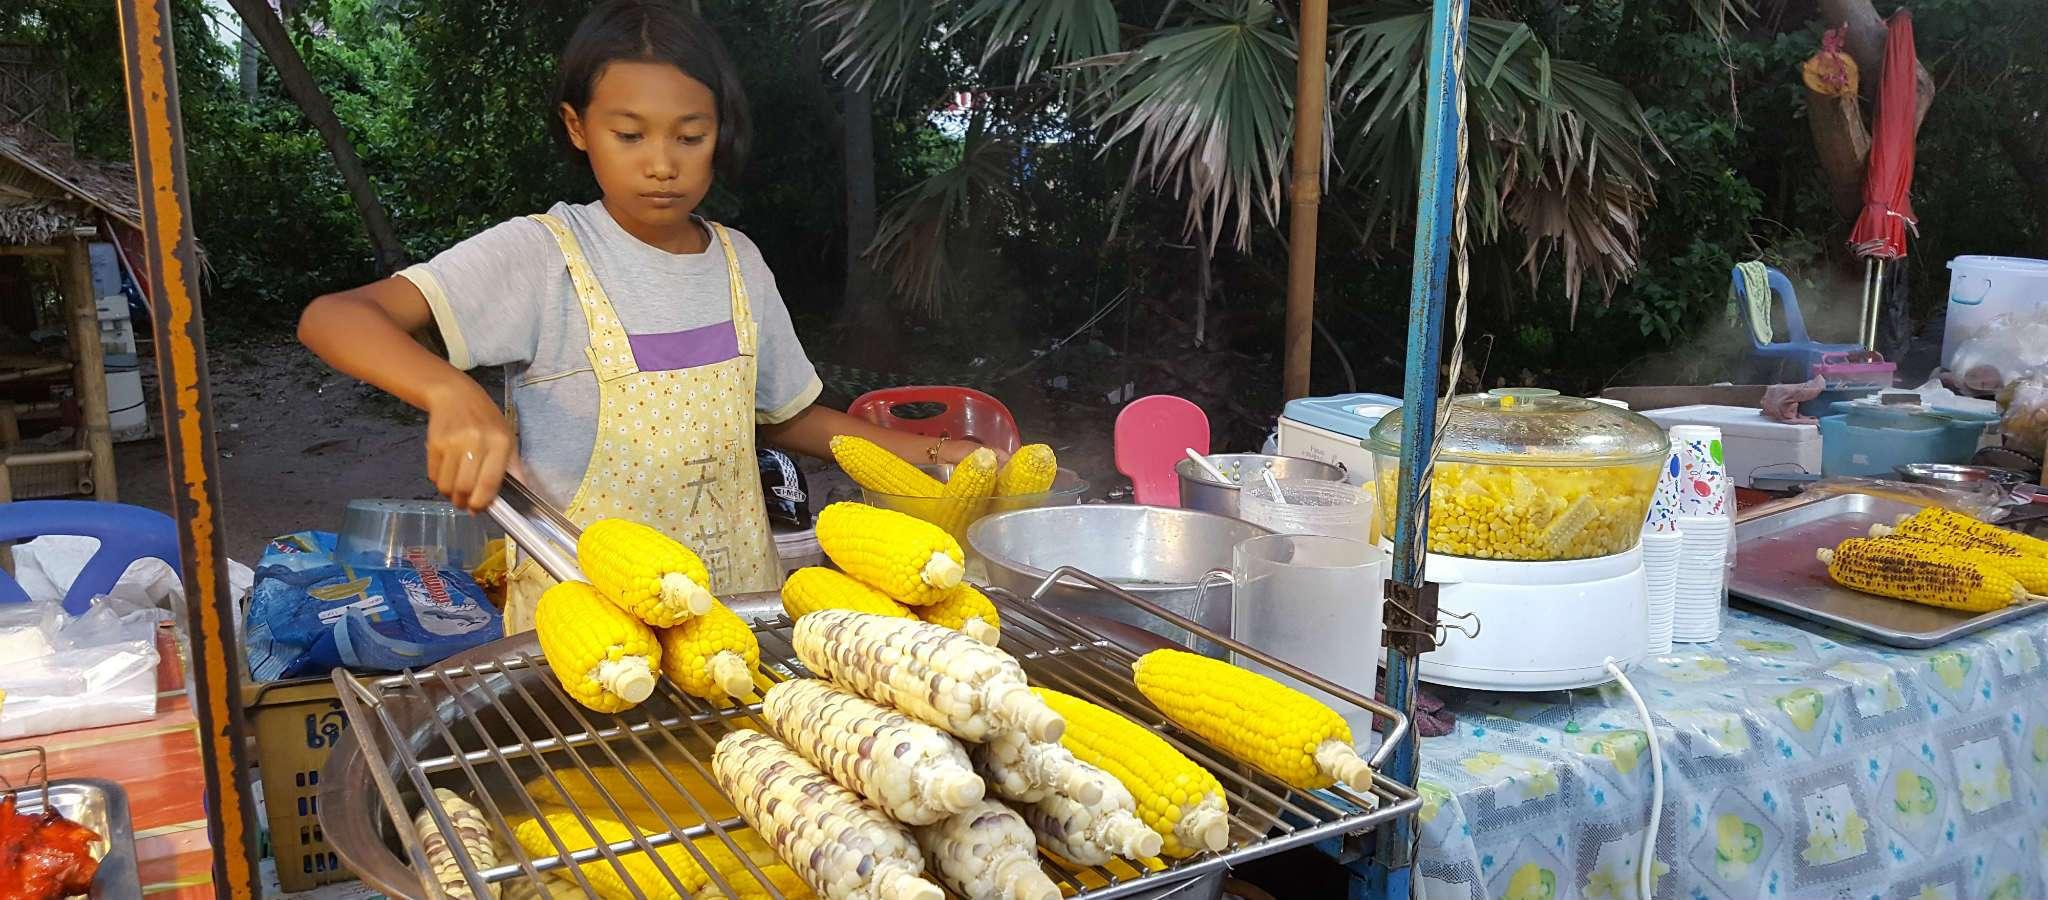 Meisje verkoopt maiskolven tijdens Fisherman's Village market van Bophut Beach.